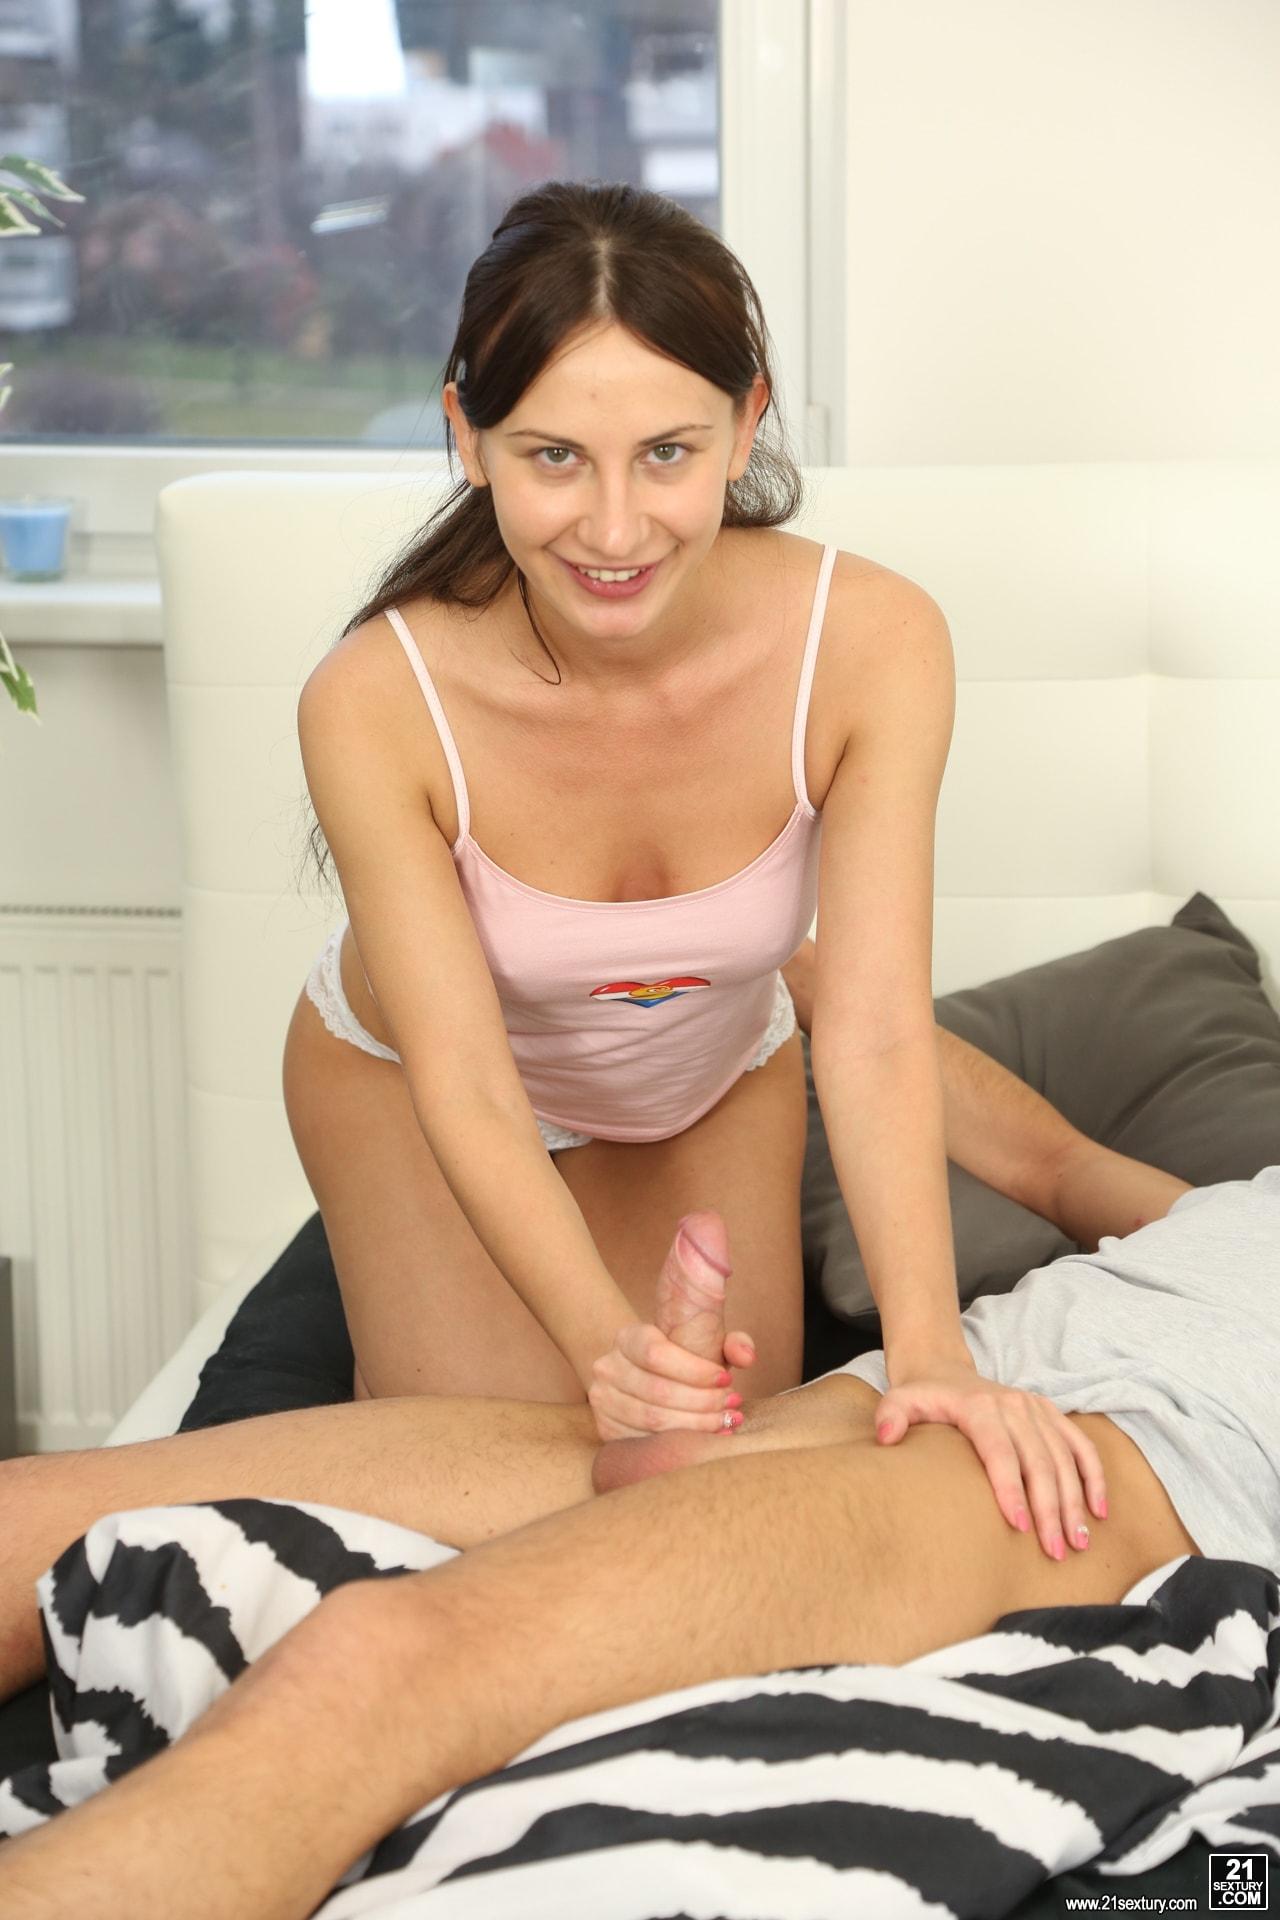 21Sextury 'Let's Watch Porn' starring Lana C (Photo 10)